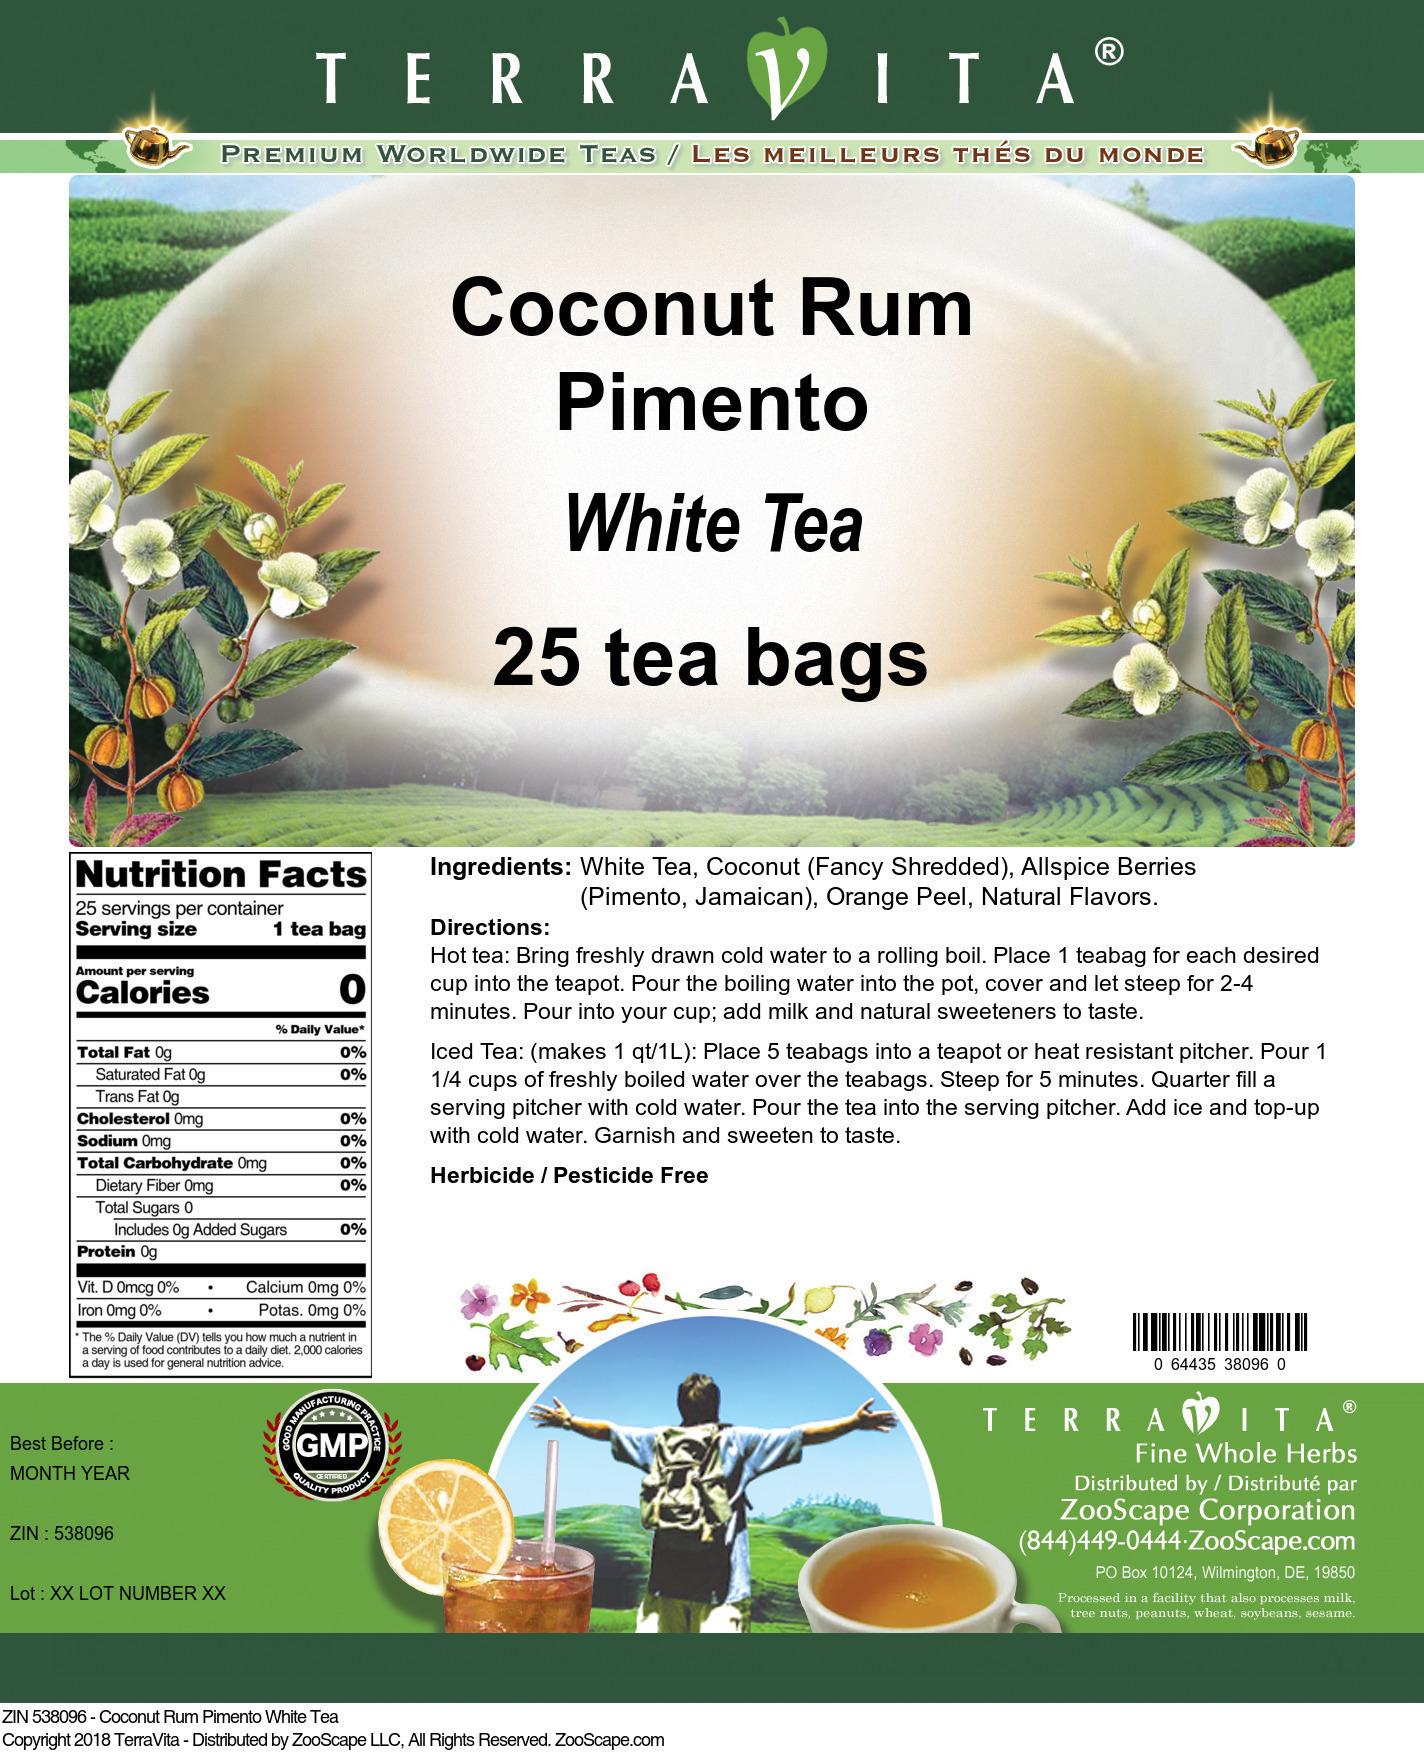 Coconut Rum Pimento White Tea